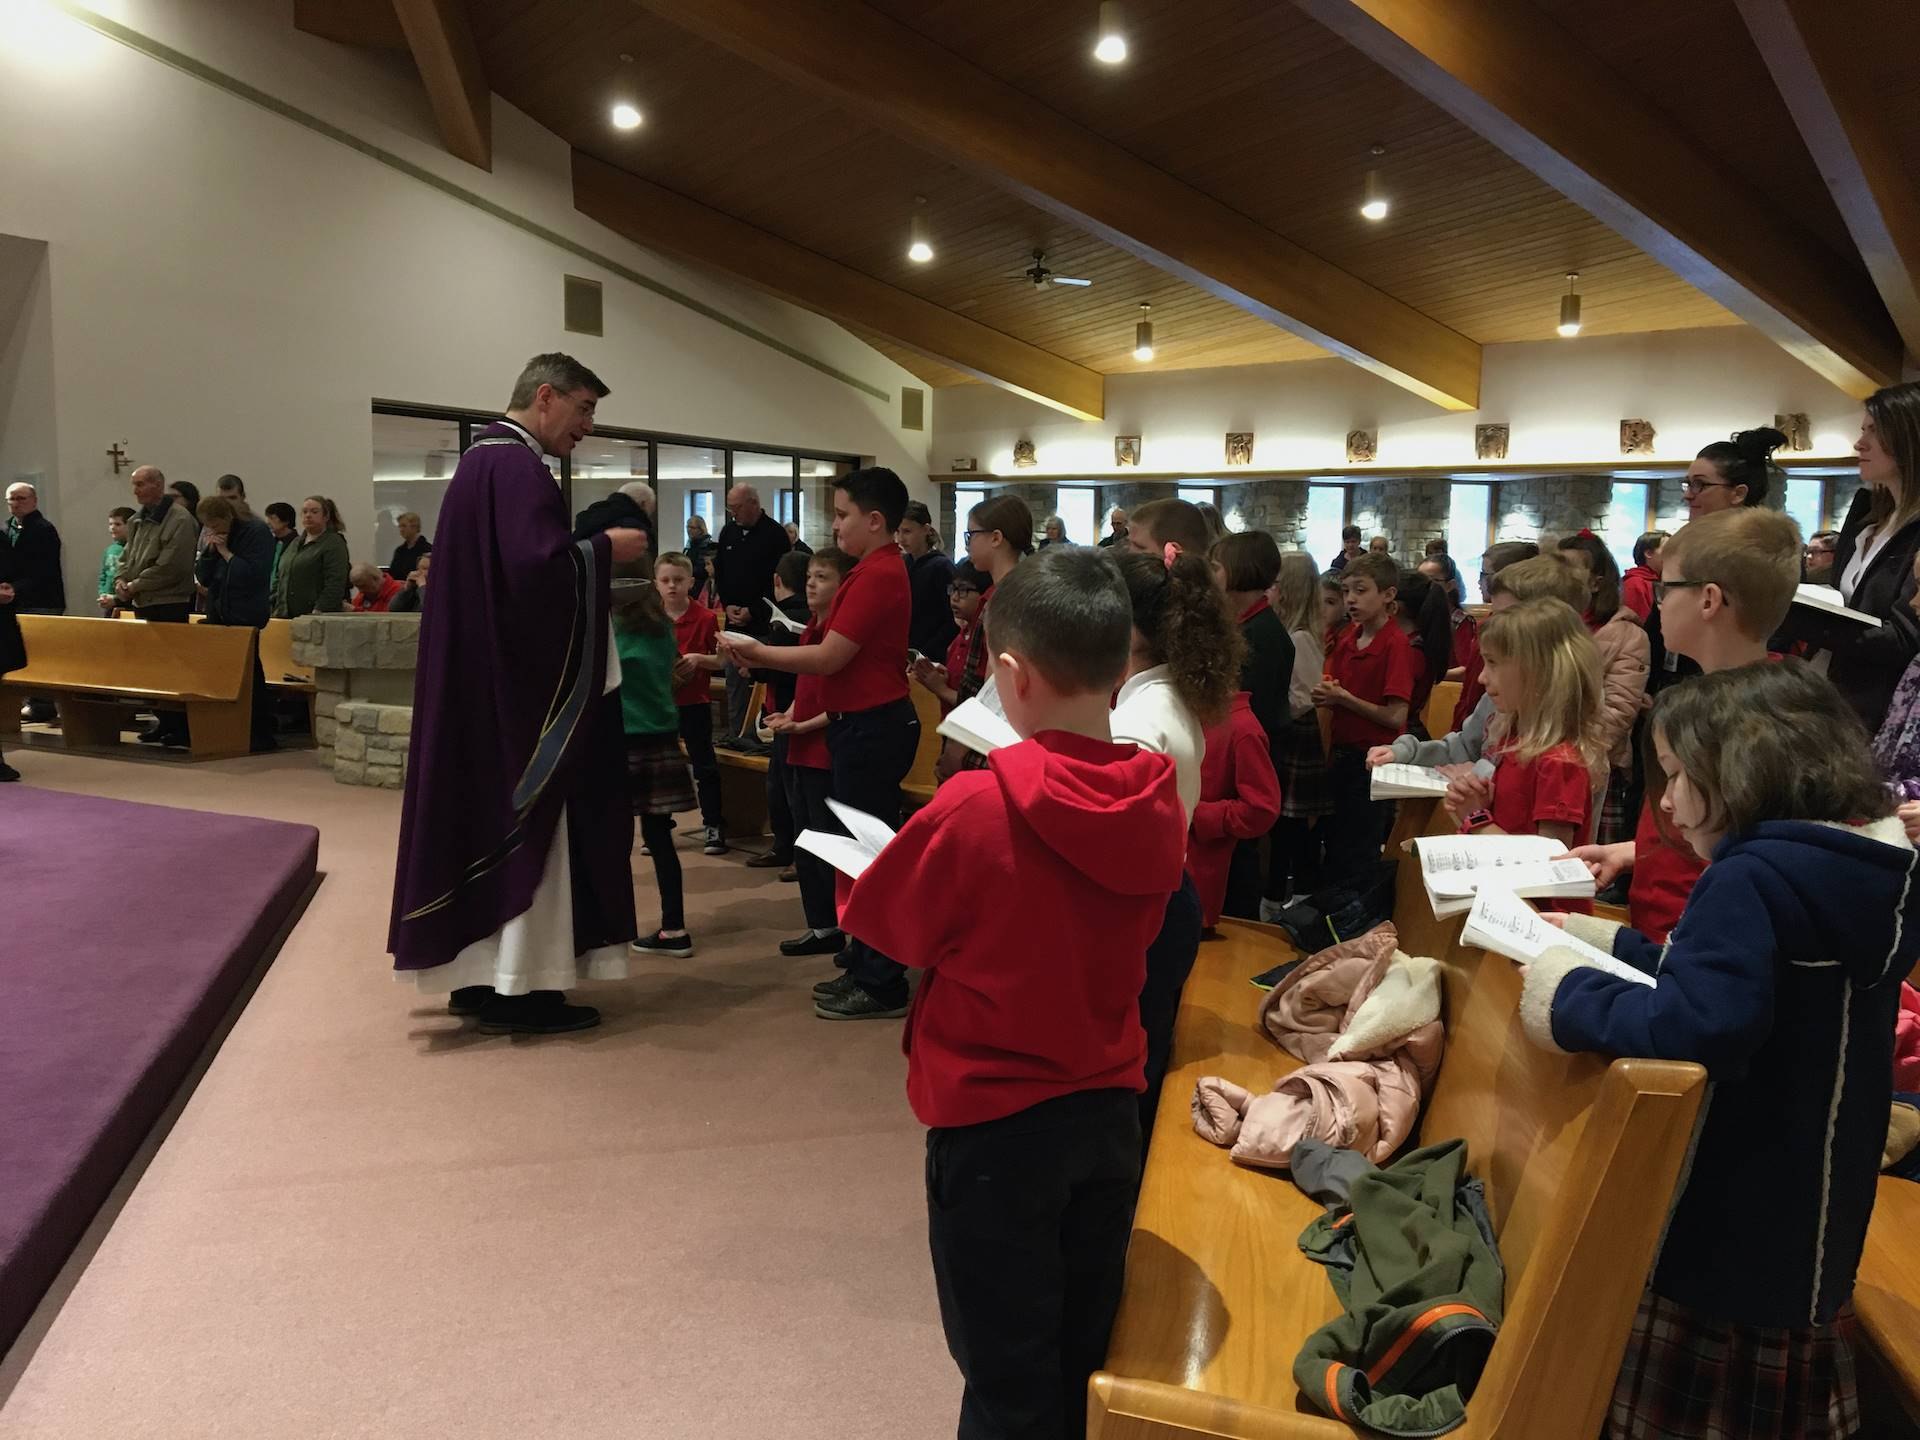 Fr tom distributes communion